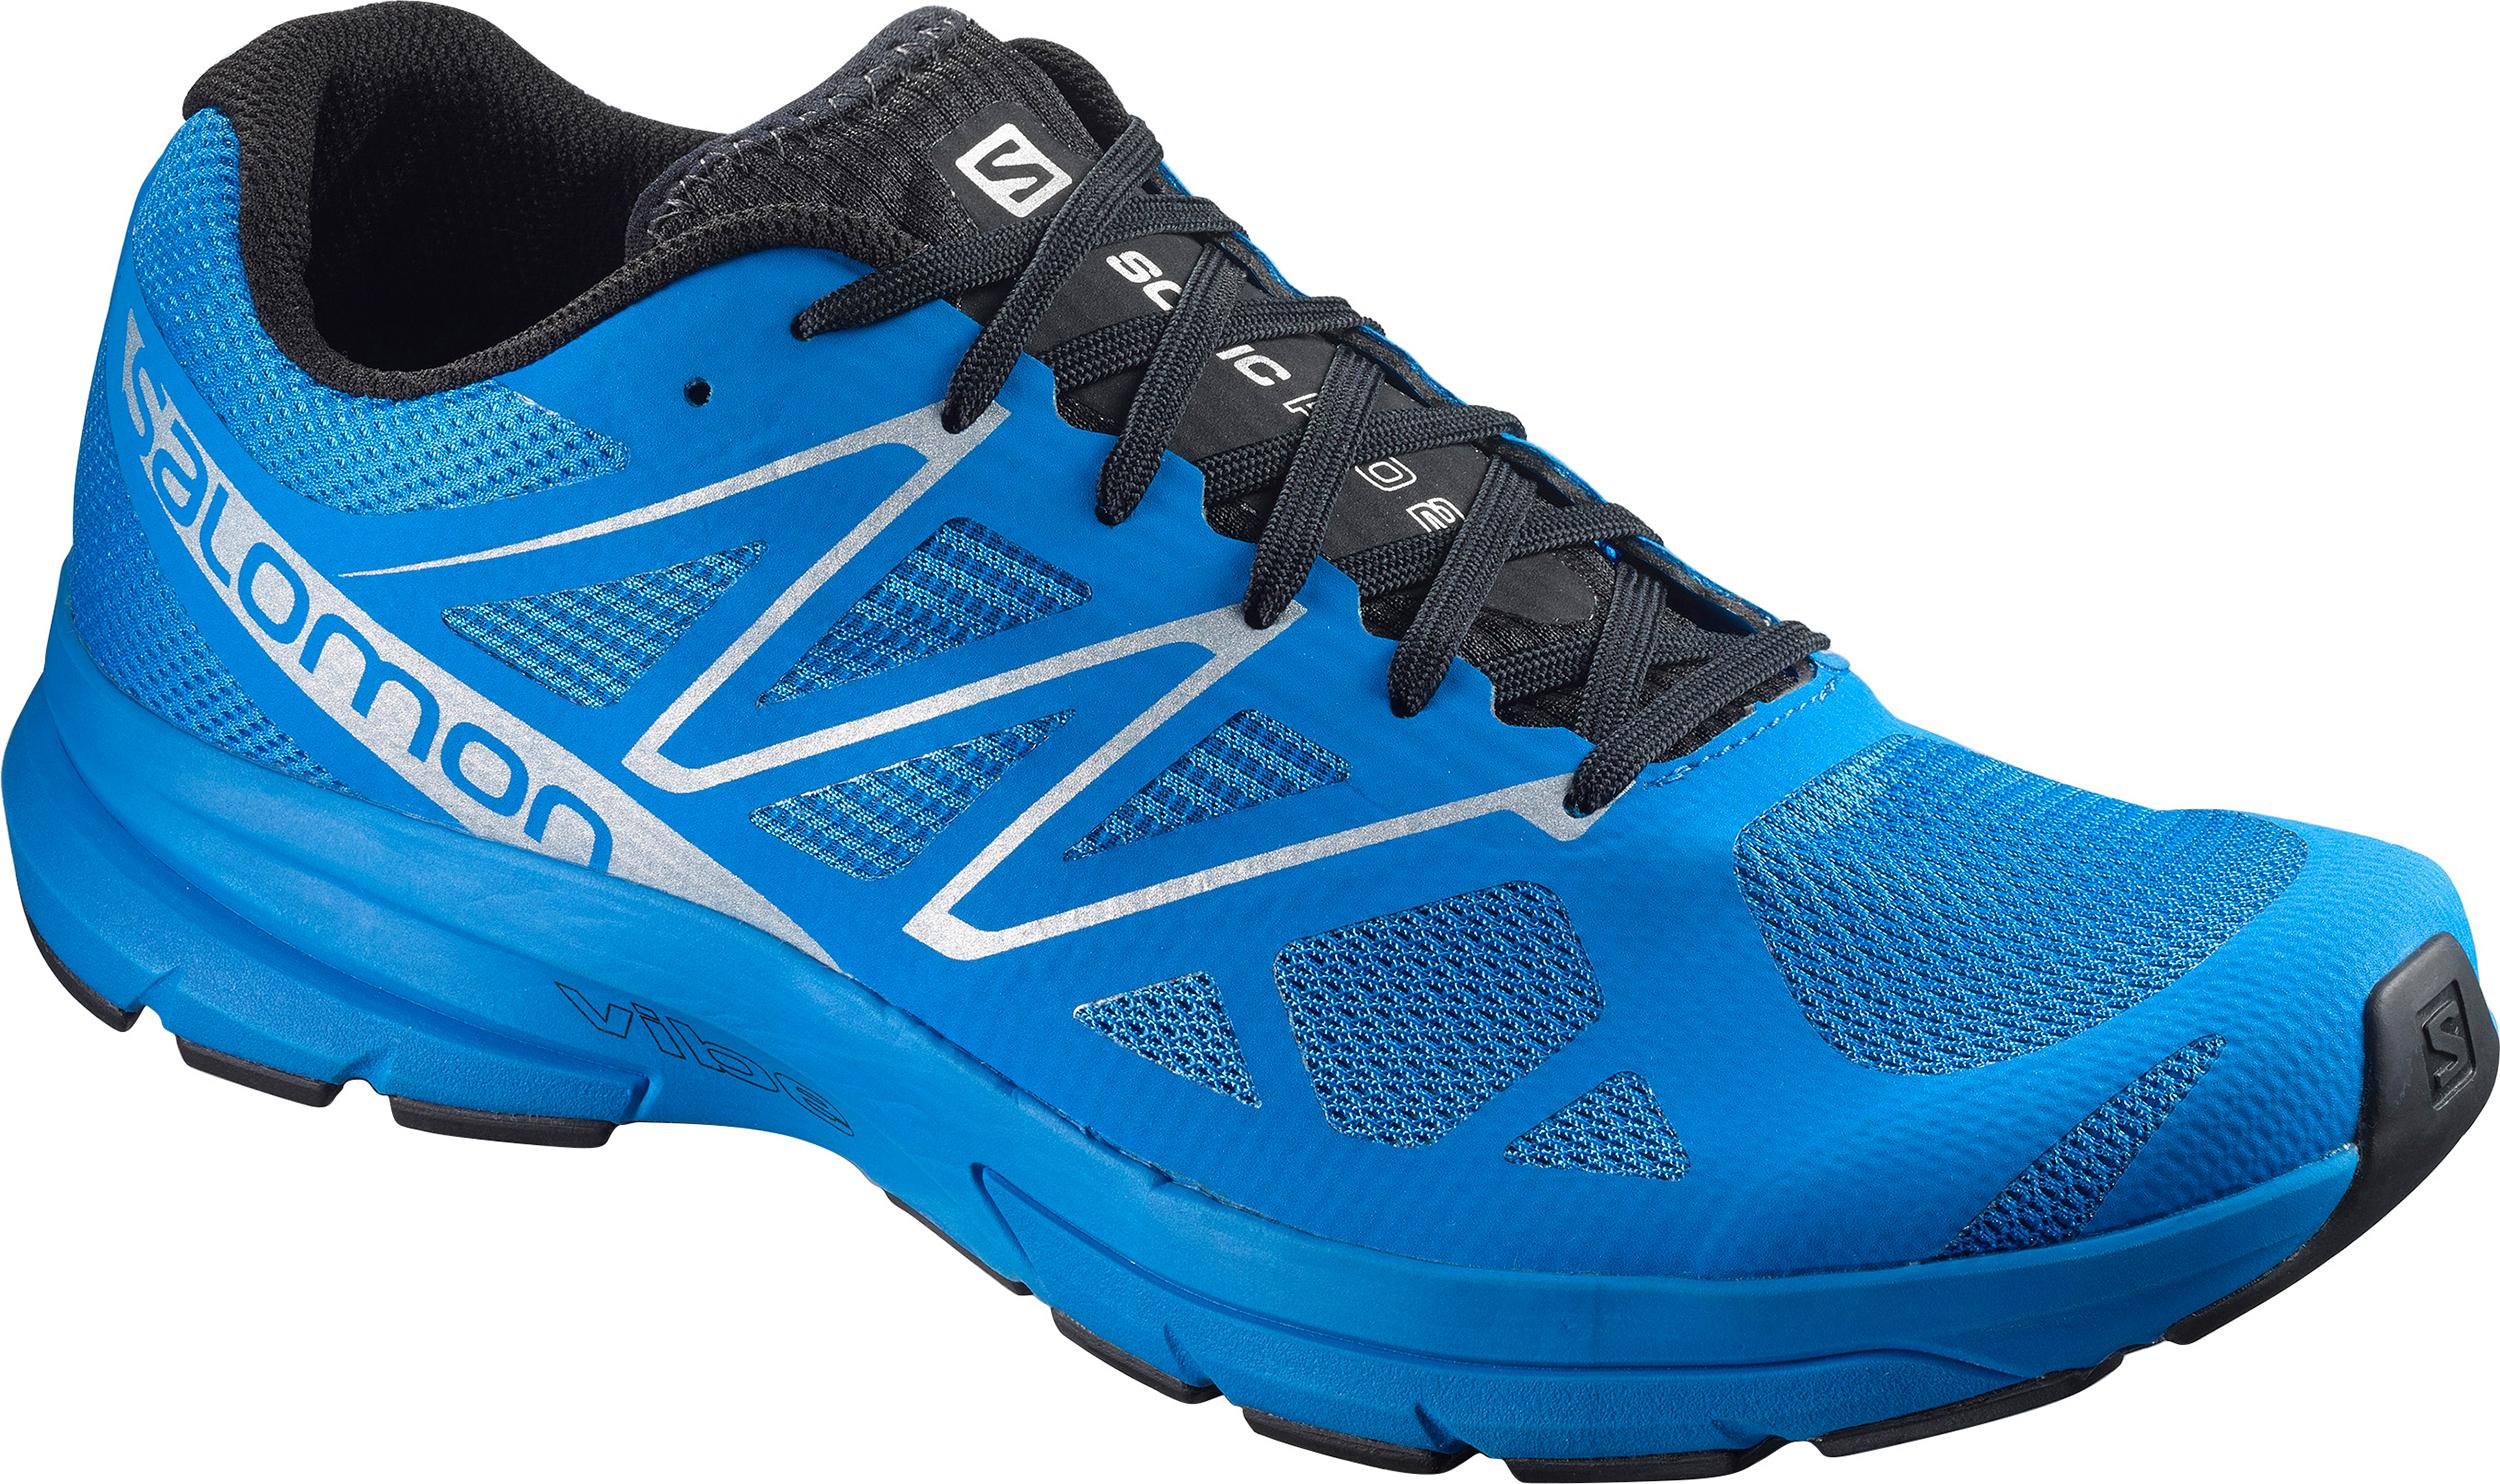 Salomon Sonic Pro 2 Road Running Shoes